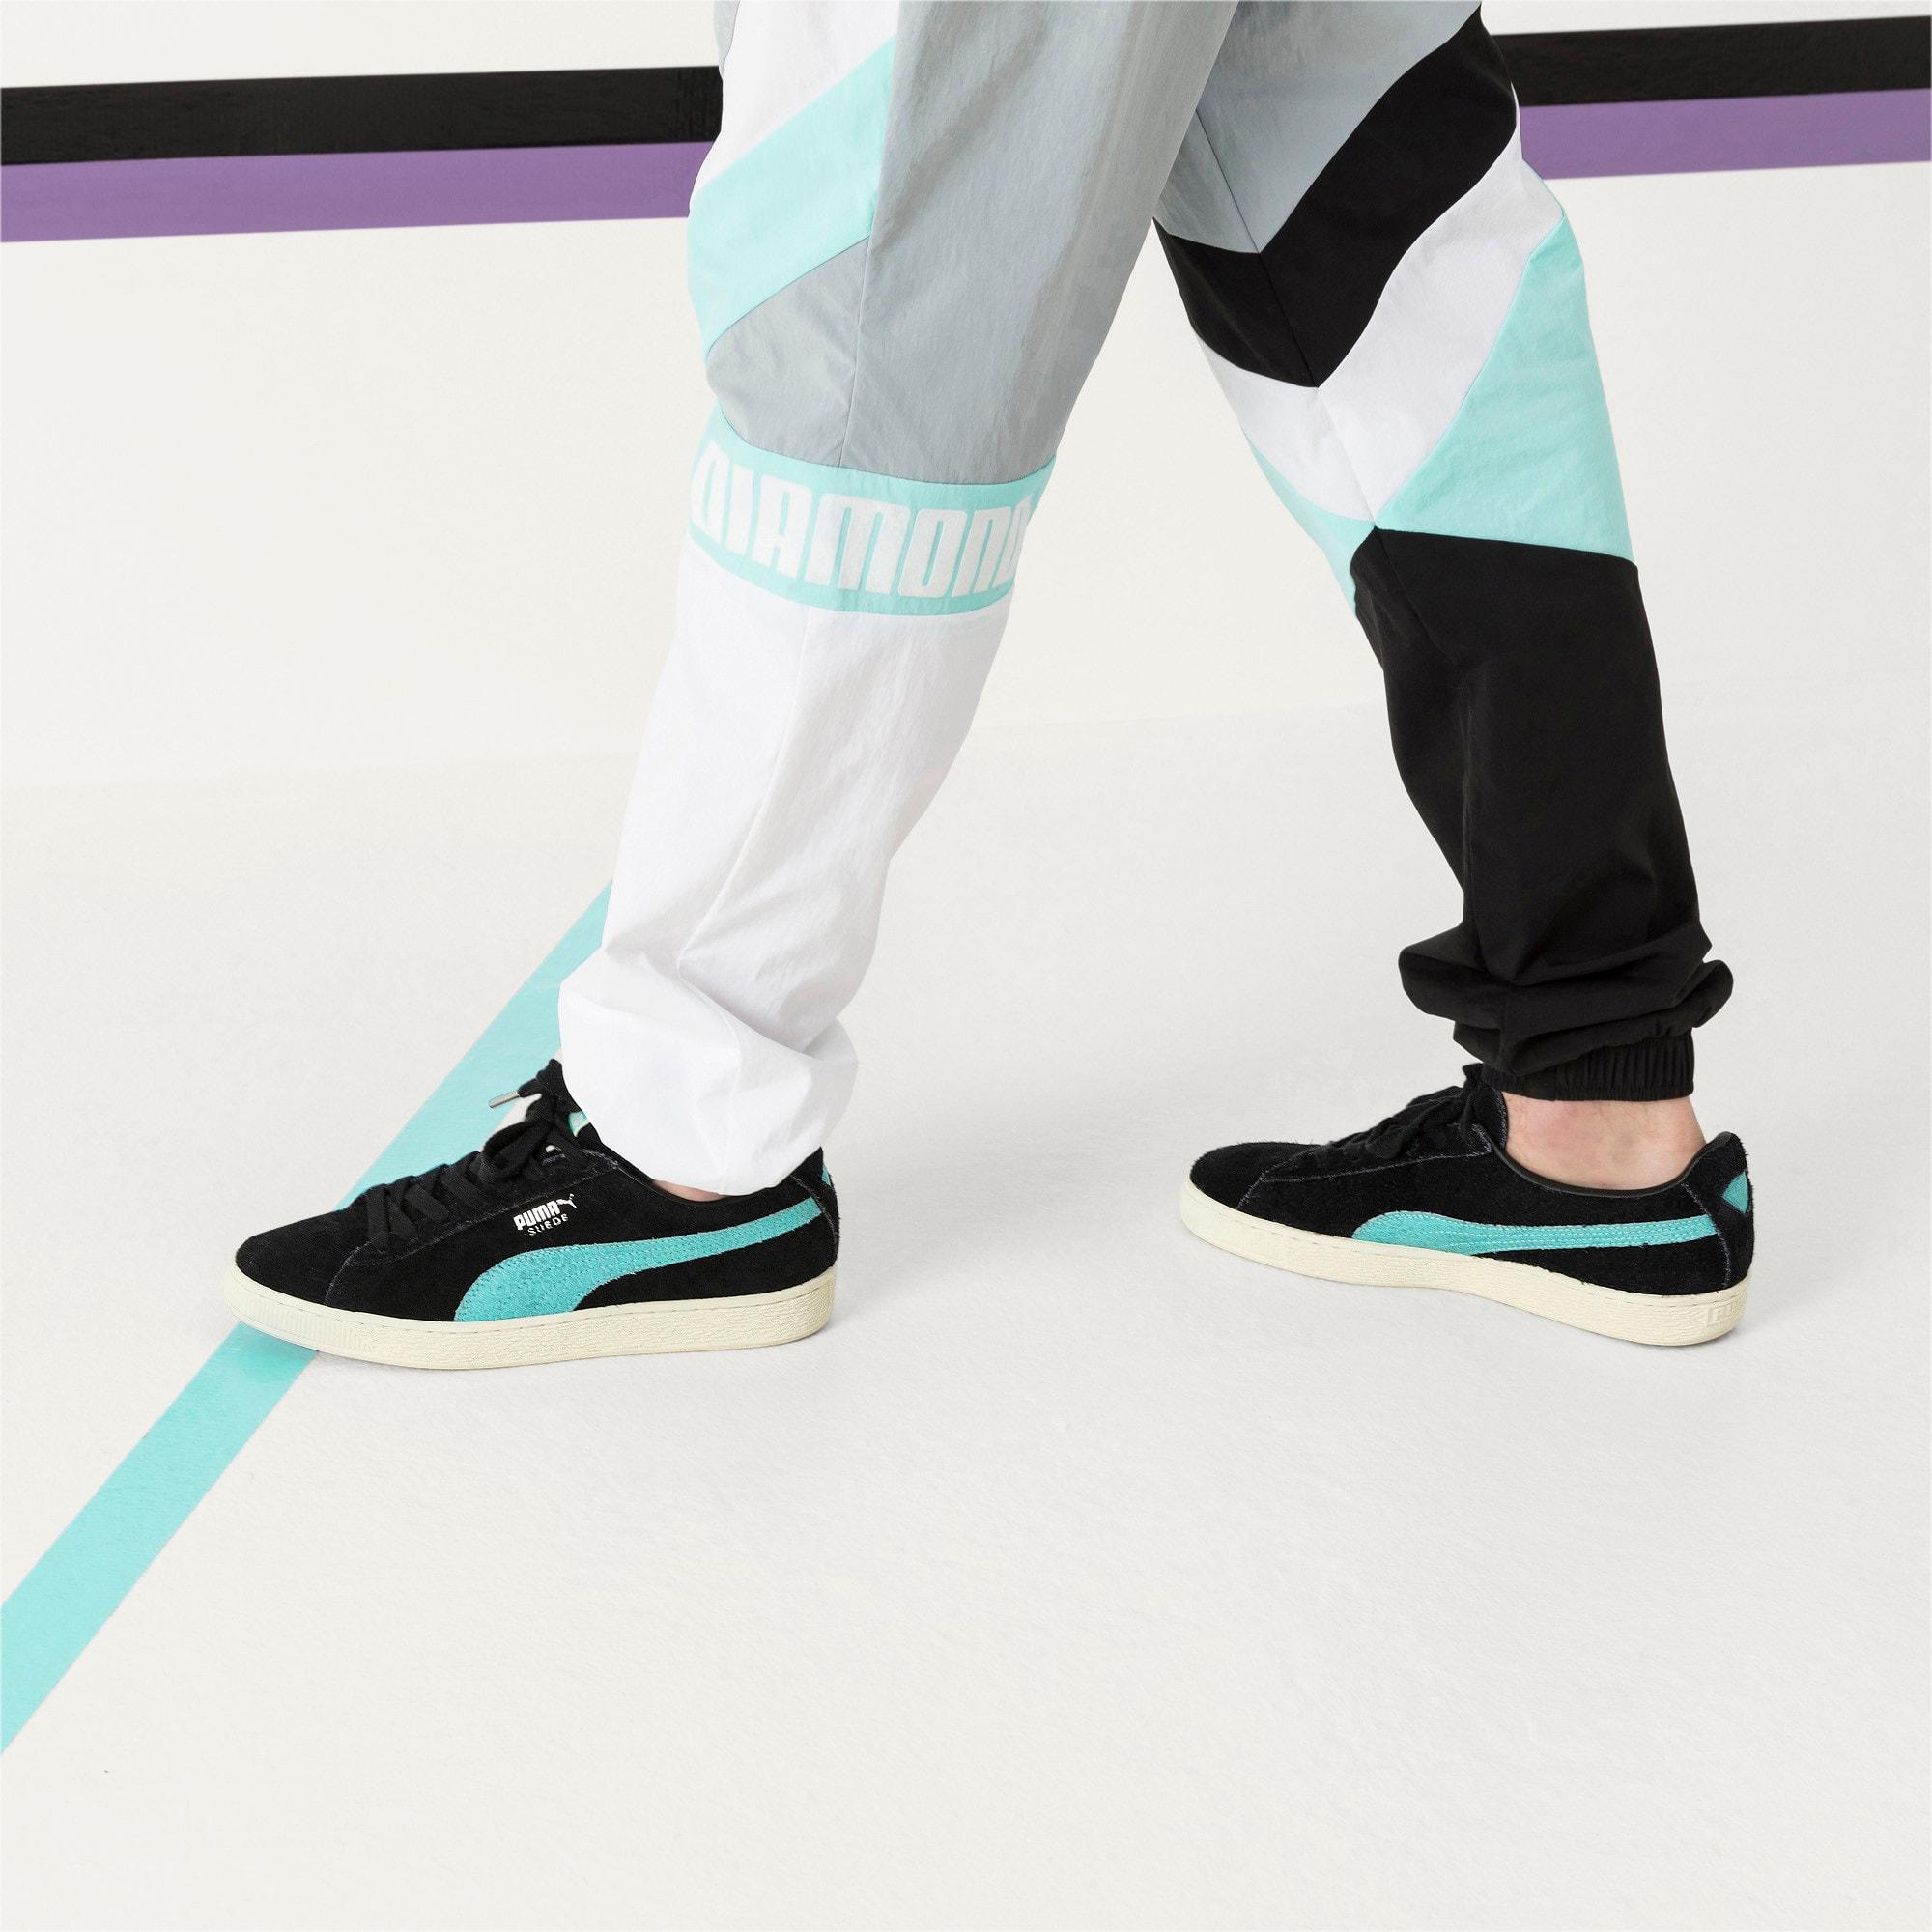 Thumbnail 7 of PUMA x DIAMOND Suede Sneakers, Puma Black-Diamond Blue, medium